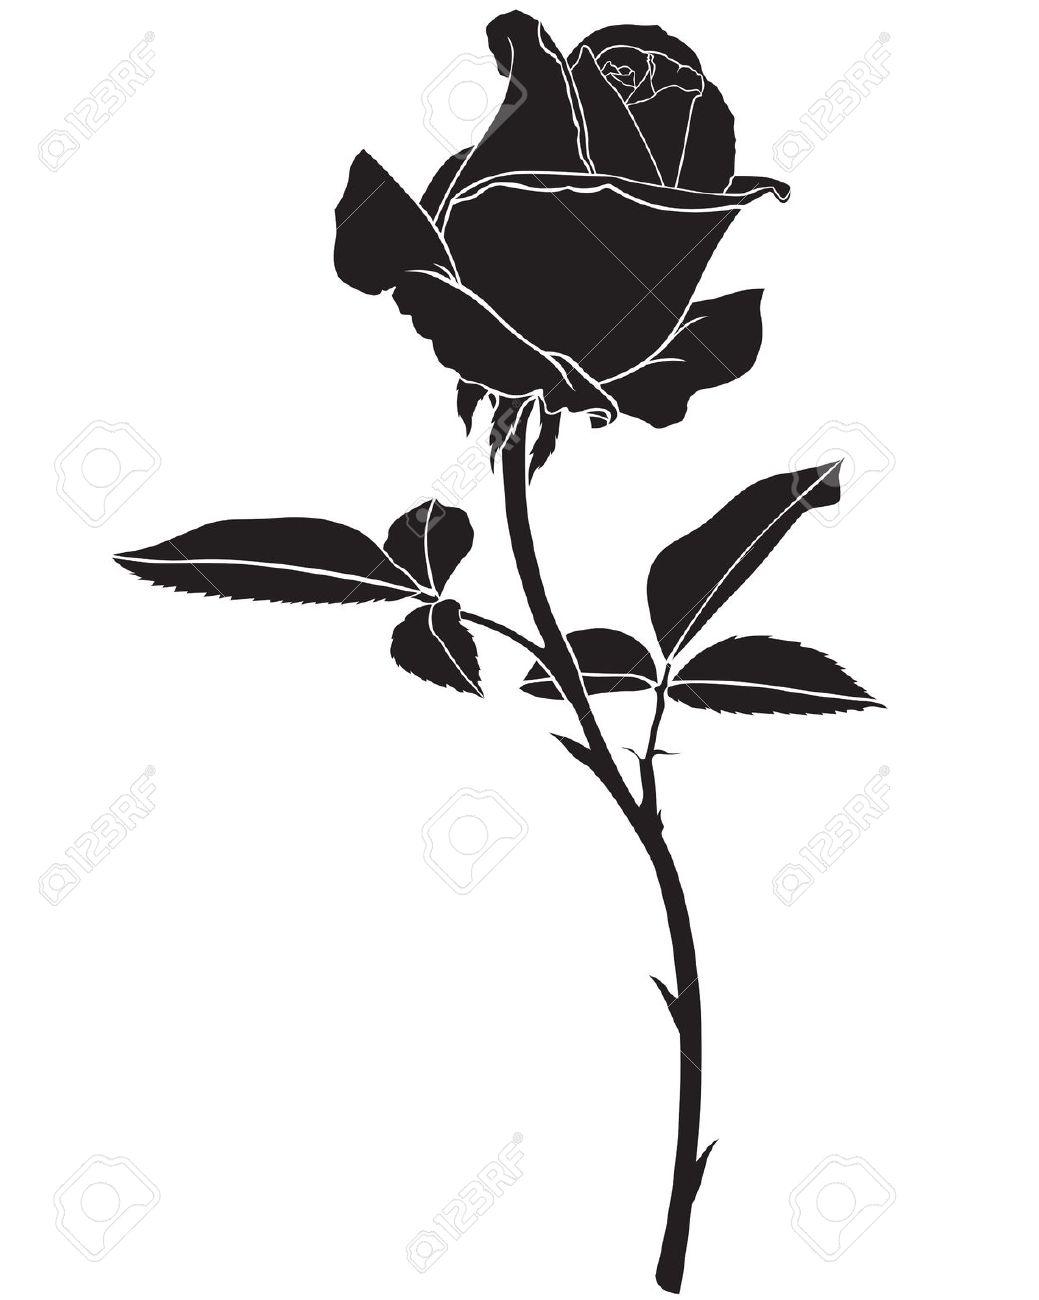 1039x1300 24805314 Silhouette Image Beautiful Rose Flower Stock Photo.jpg